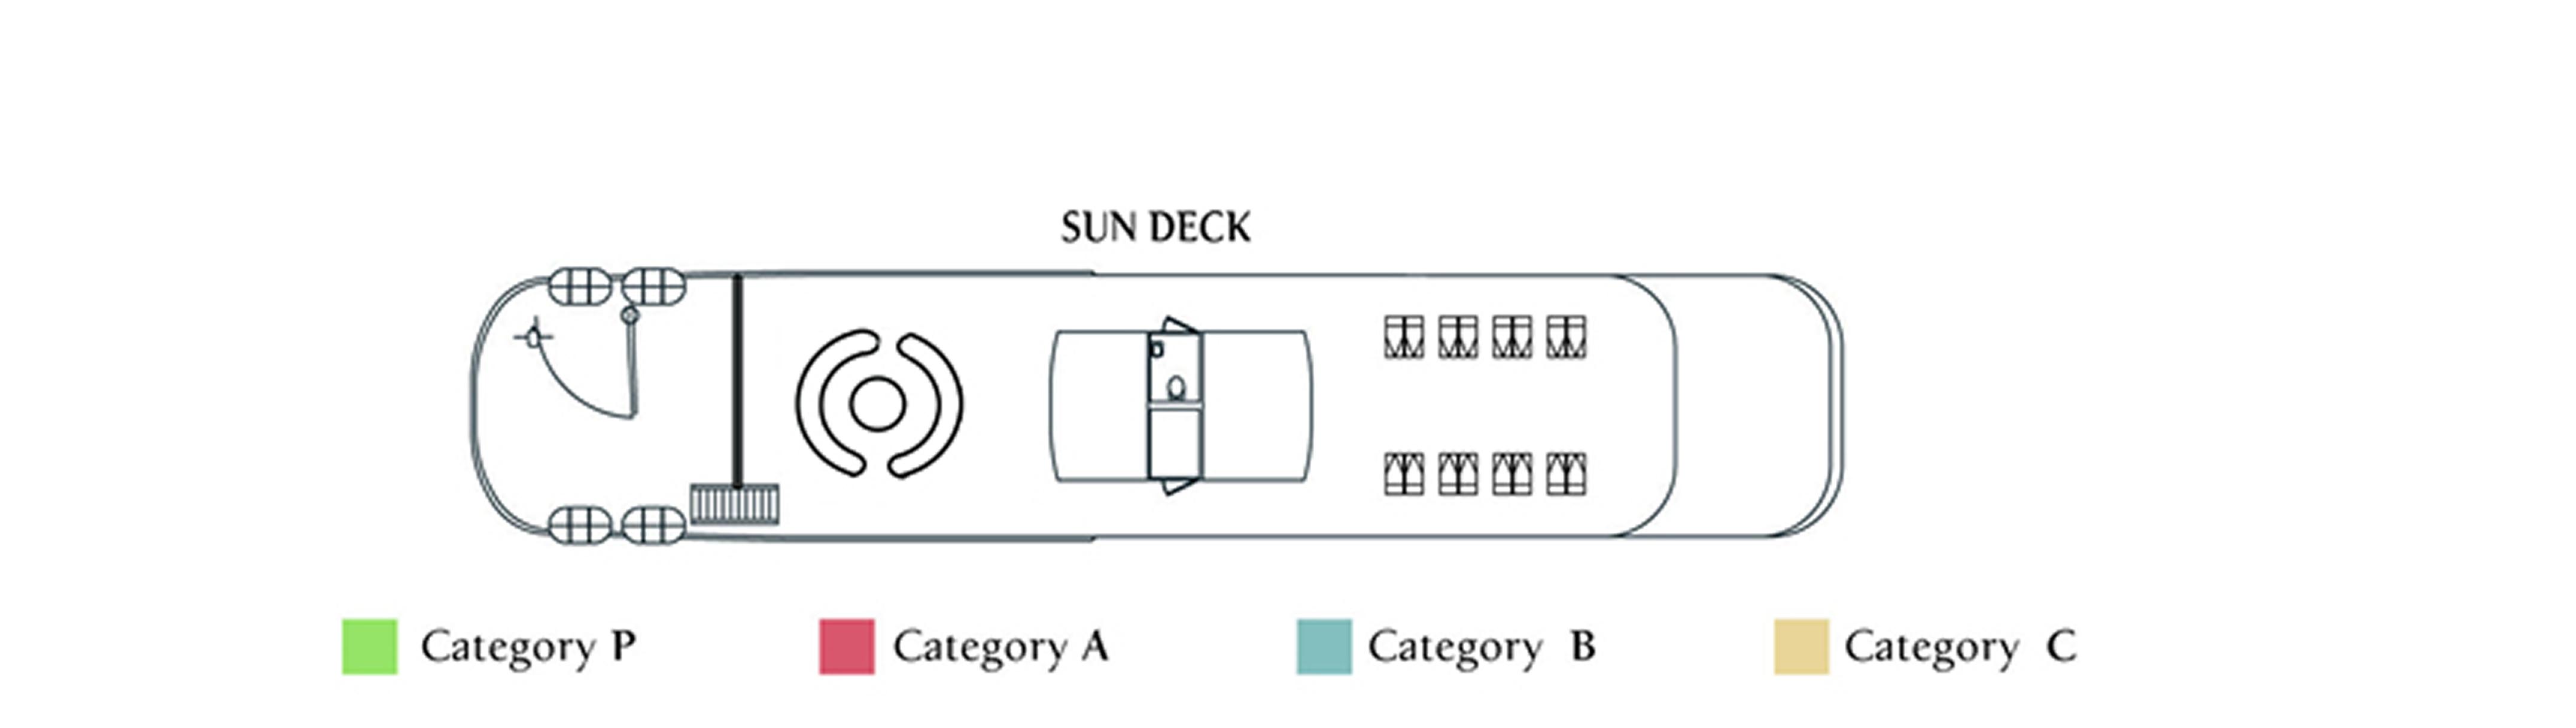 M/Y Harmony G, Sun Deck